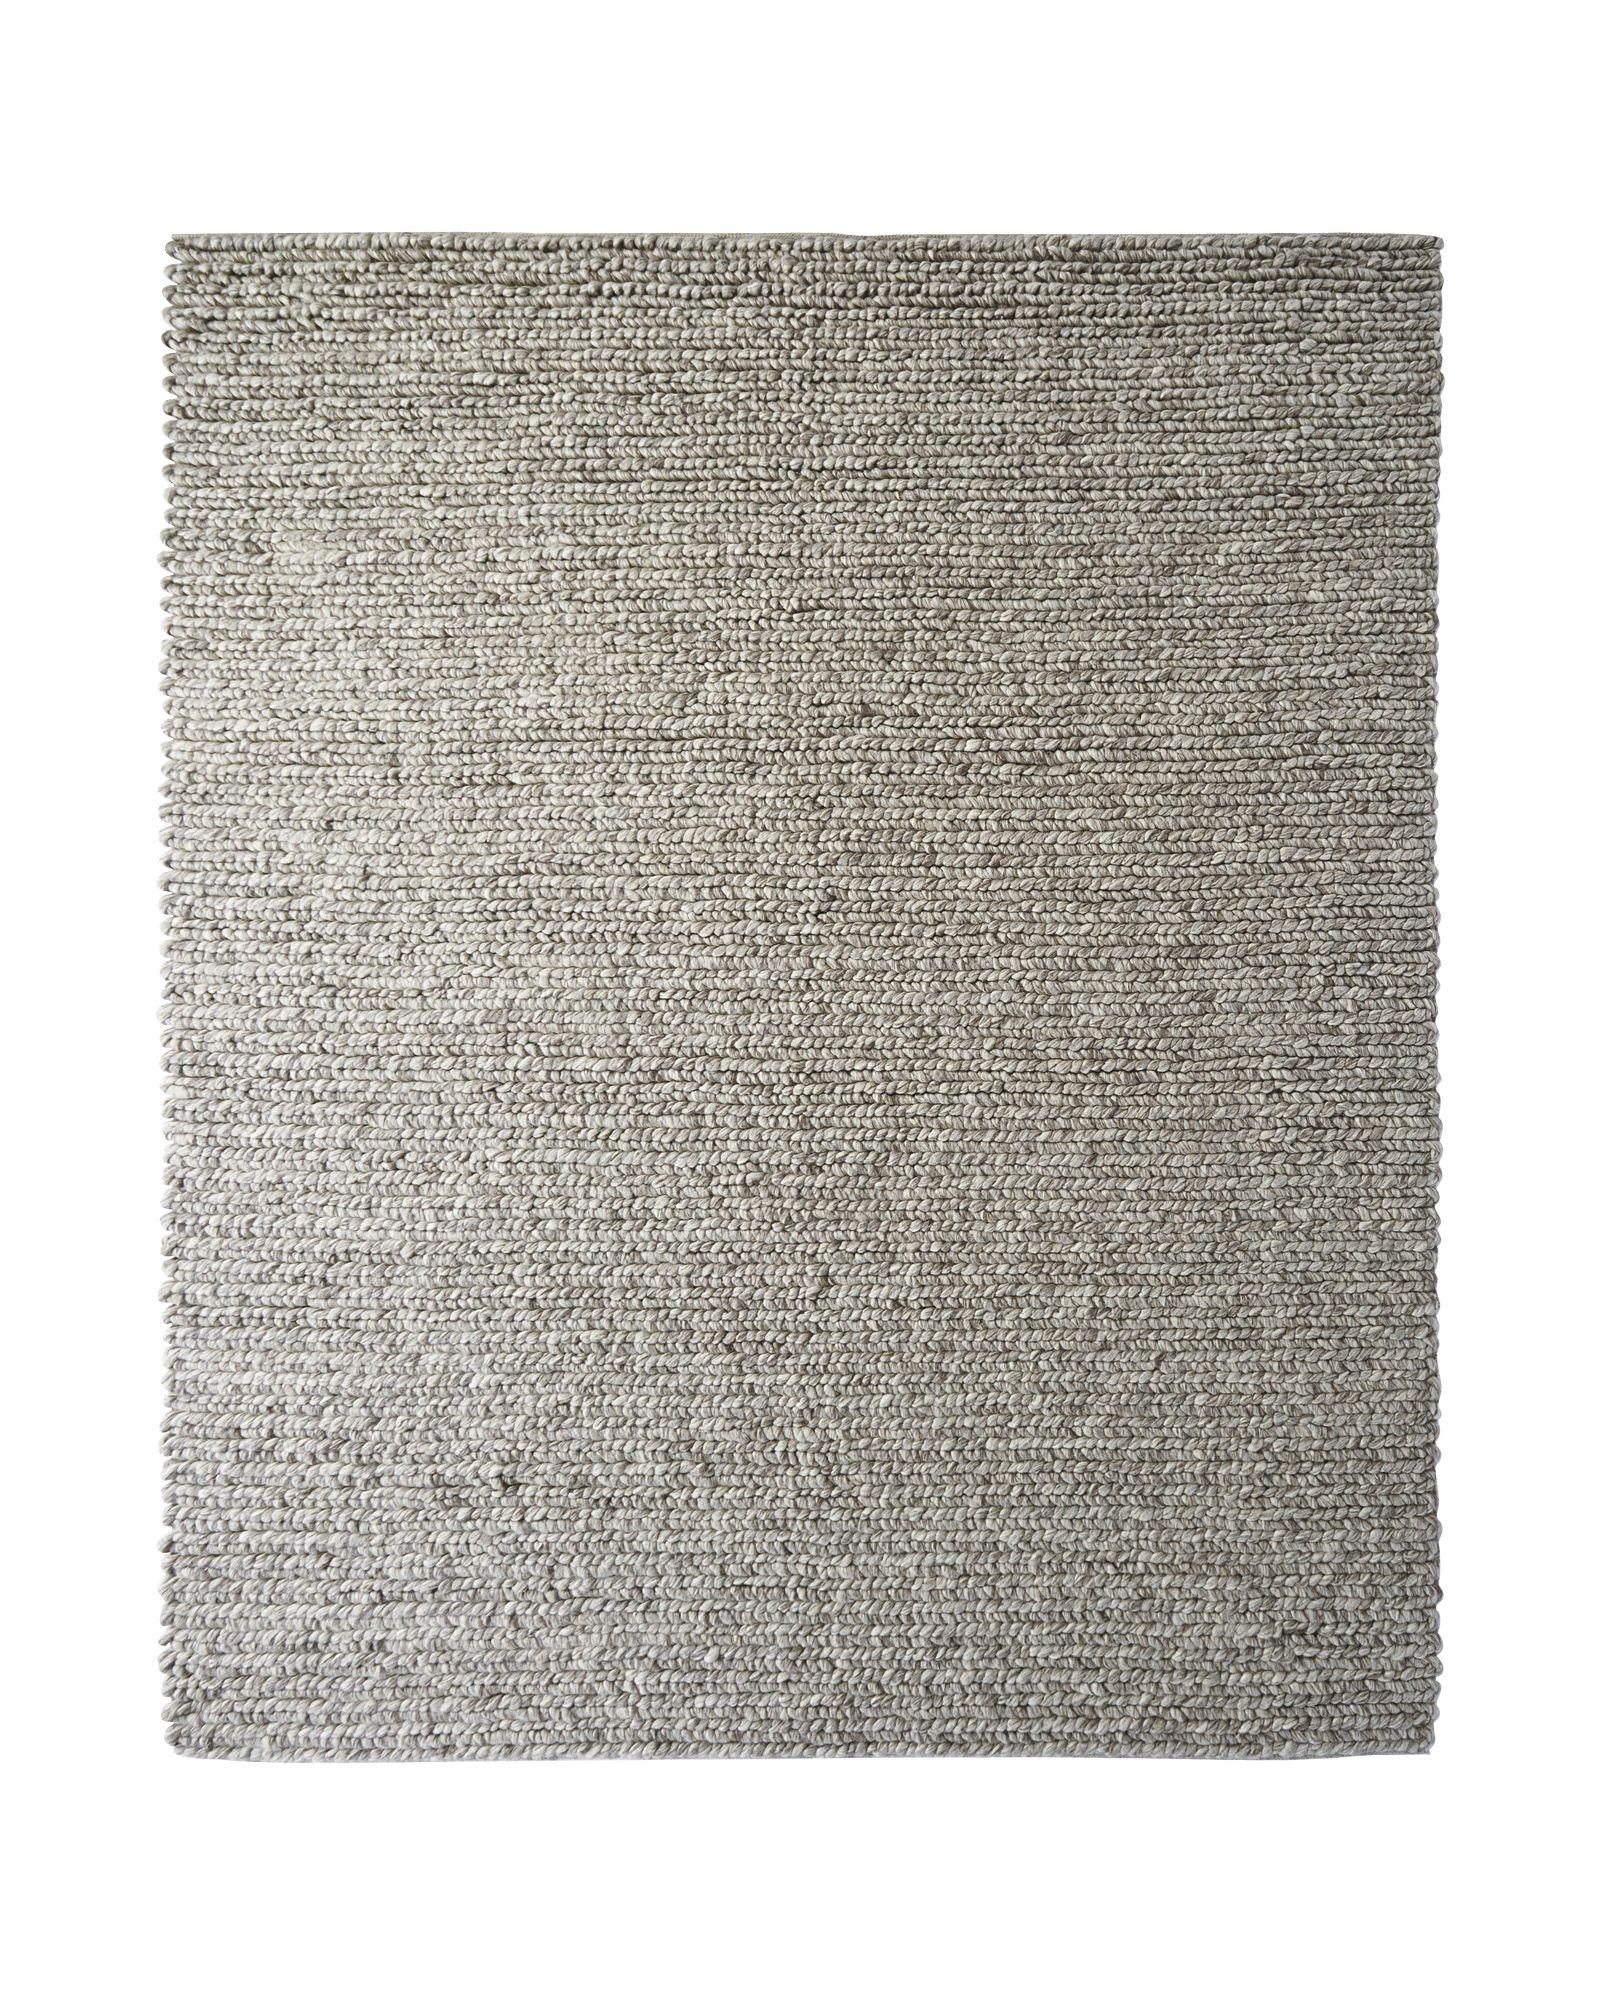 Braided Wool Rug   Braided wool rug, Braided rug diy, Diy rug